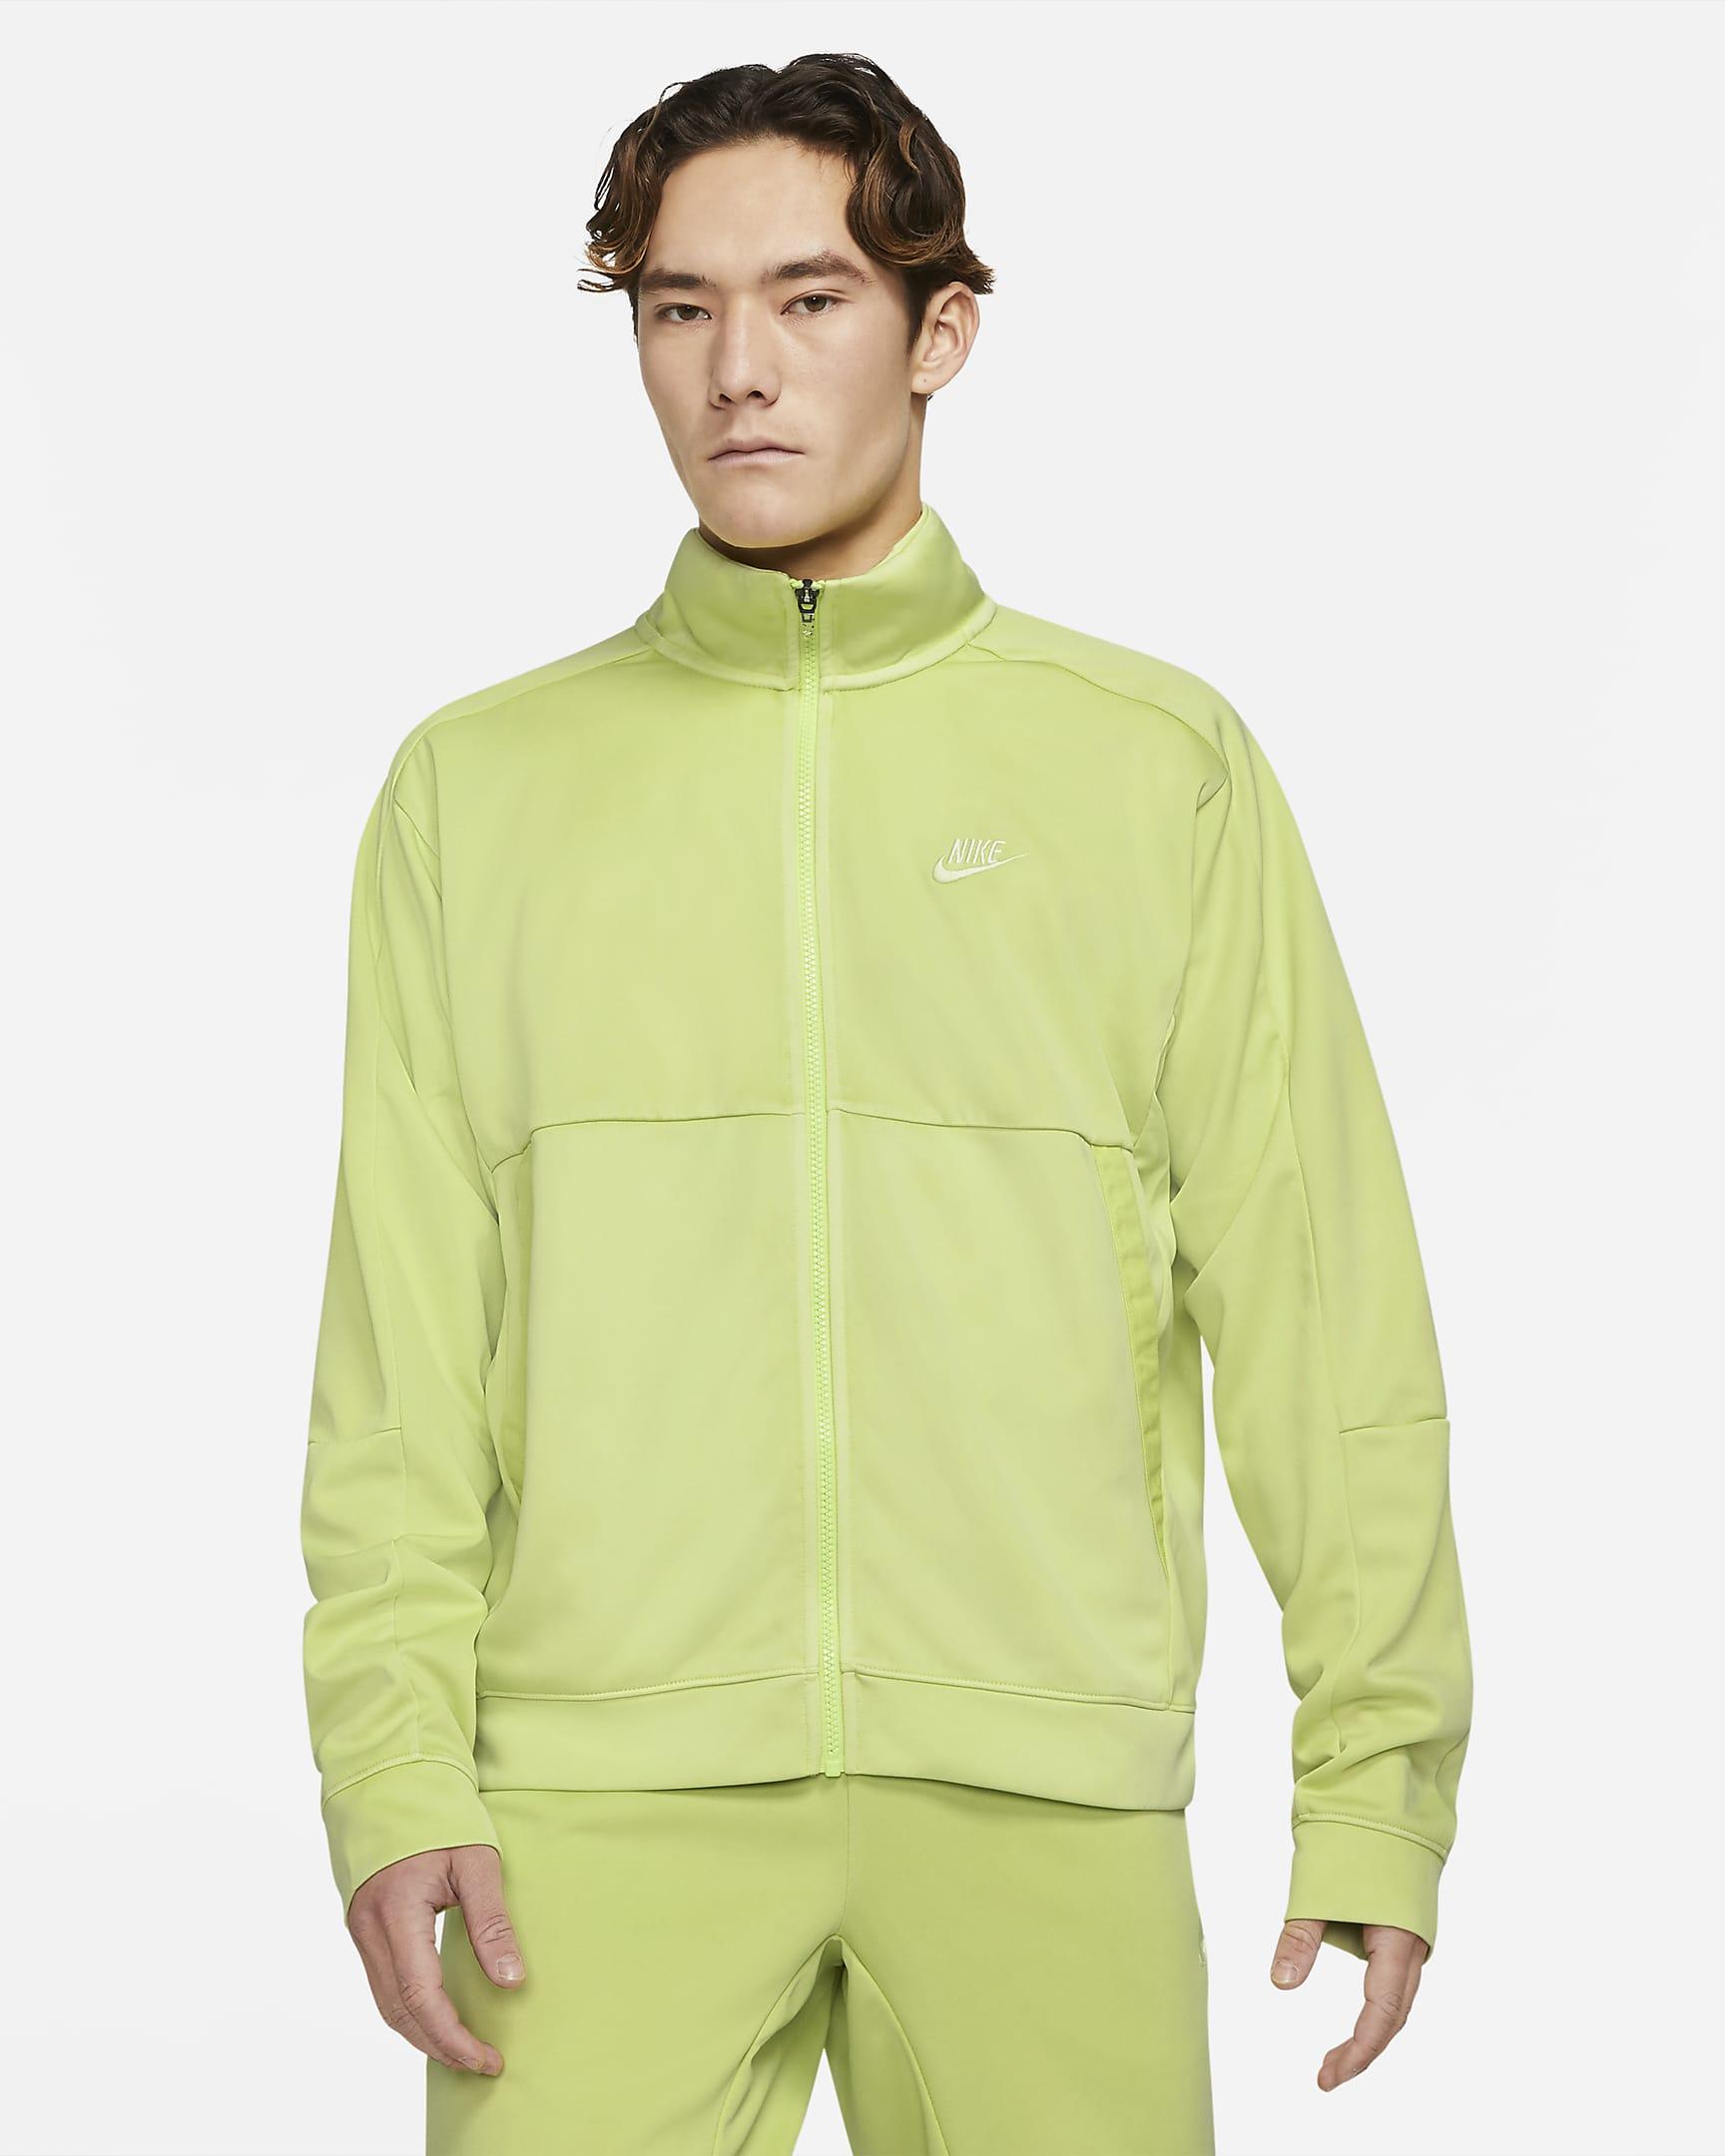 nike-sportswear-mens-jersey-jacket-P0b0Mp.png